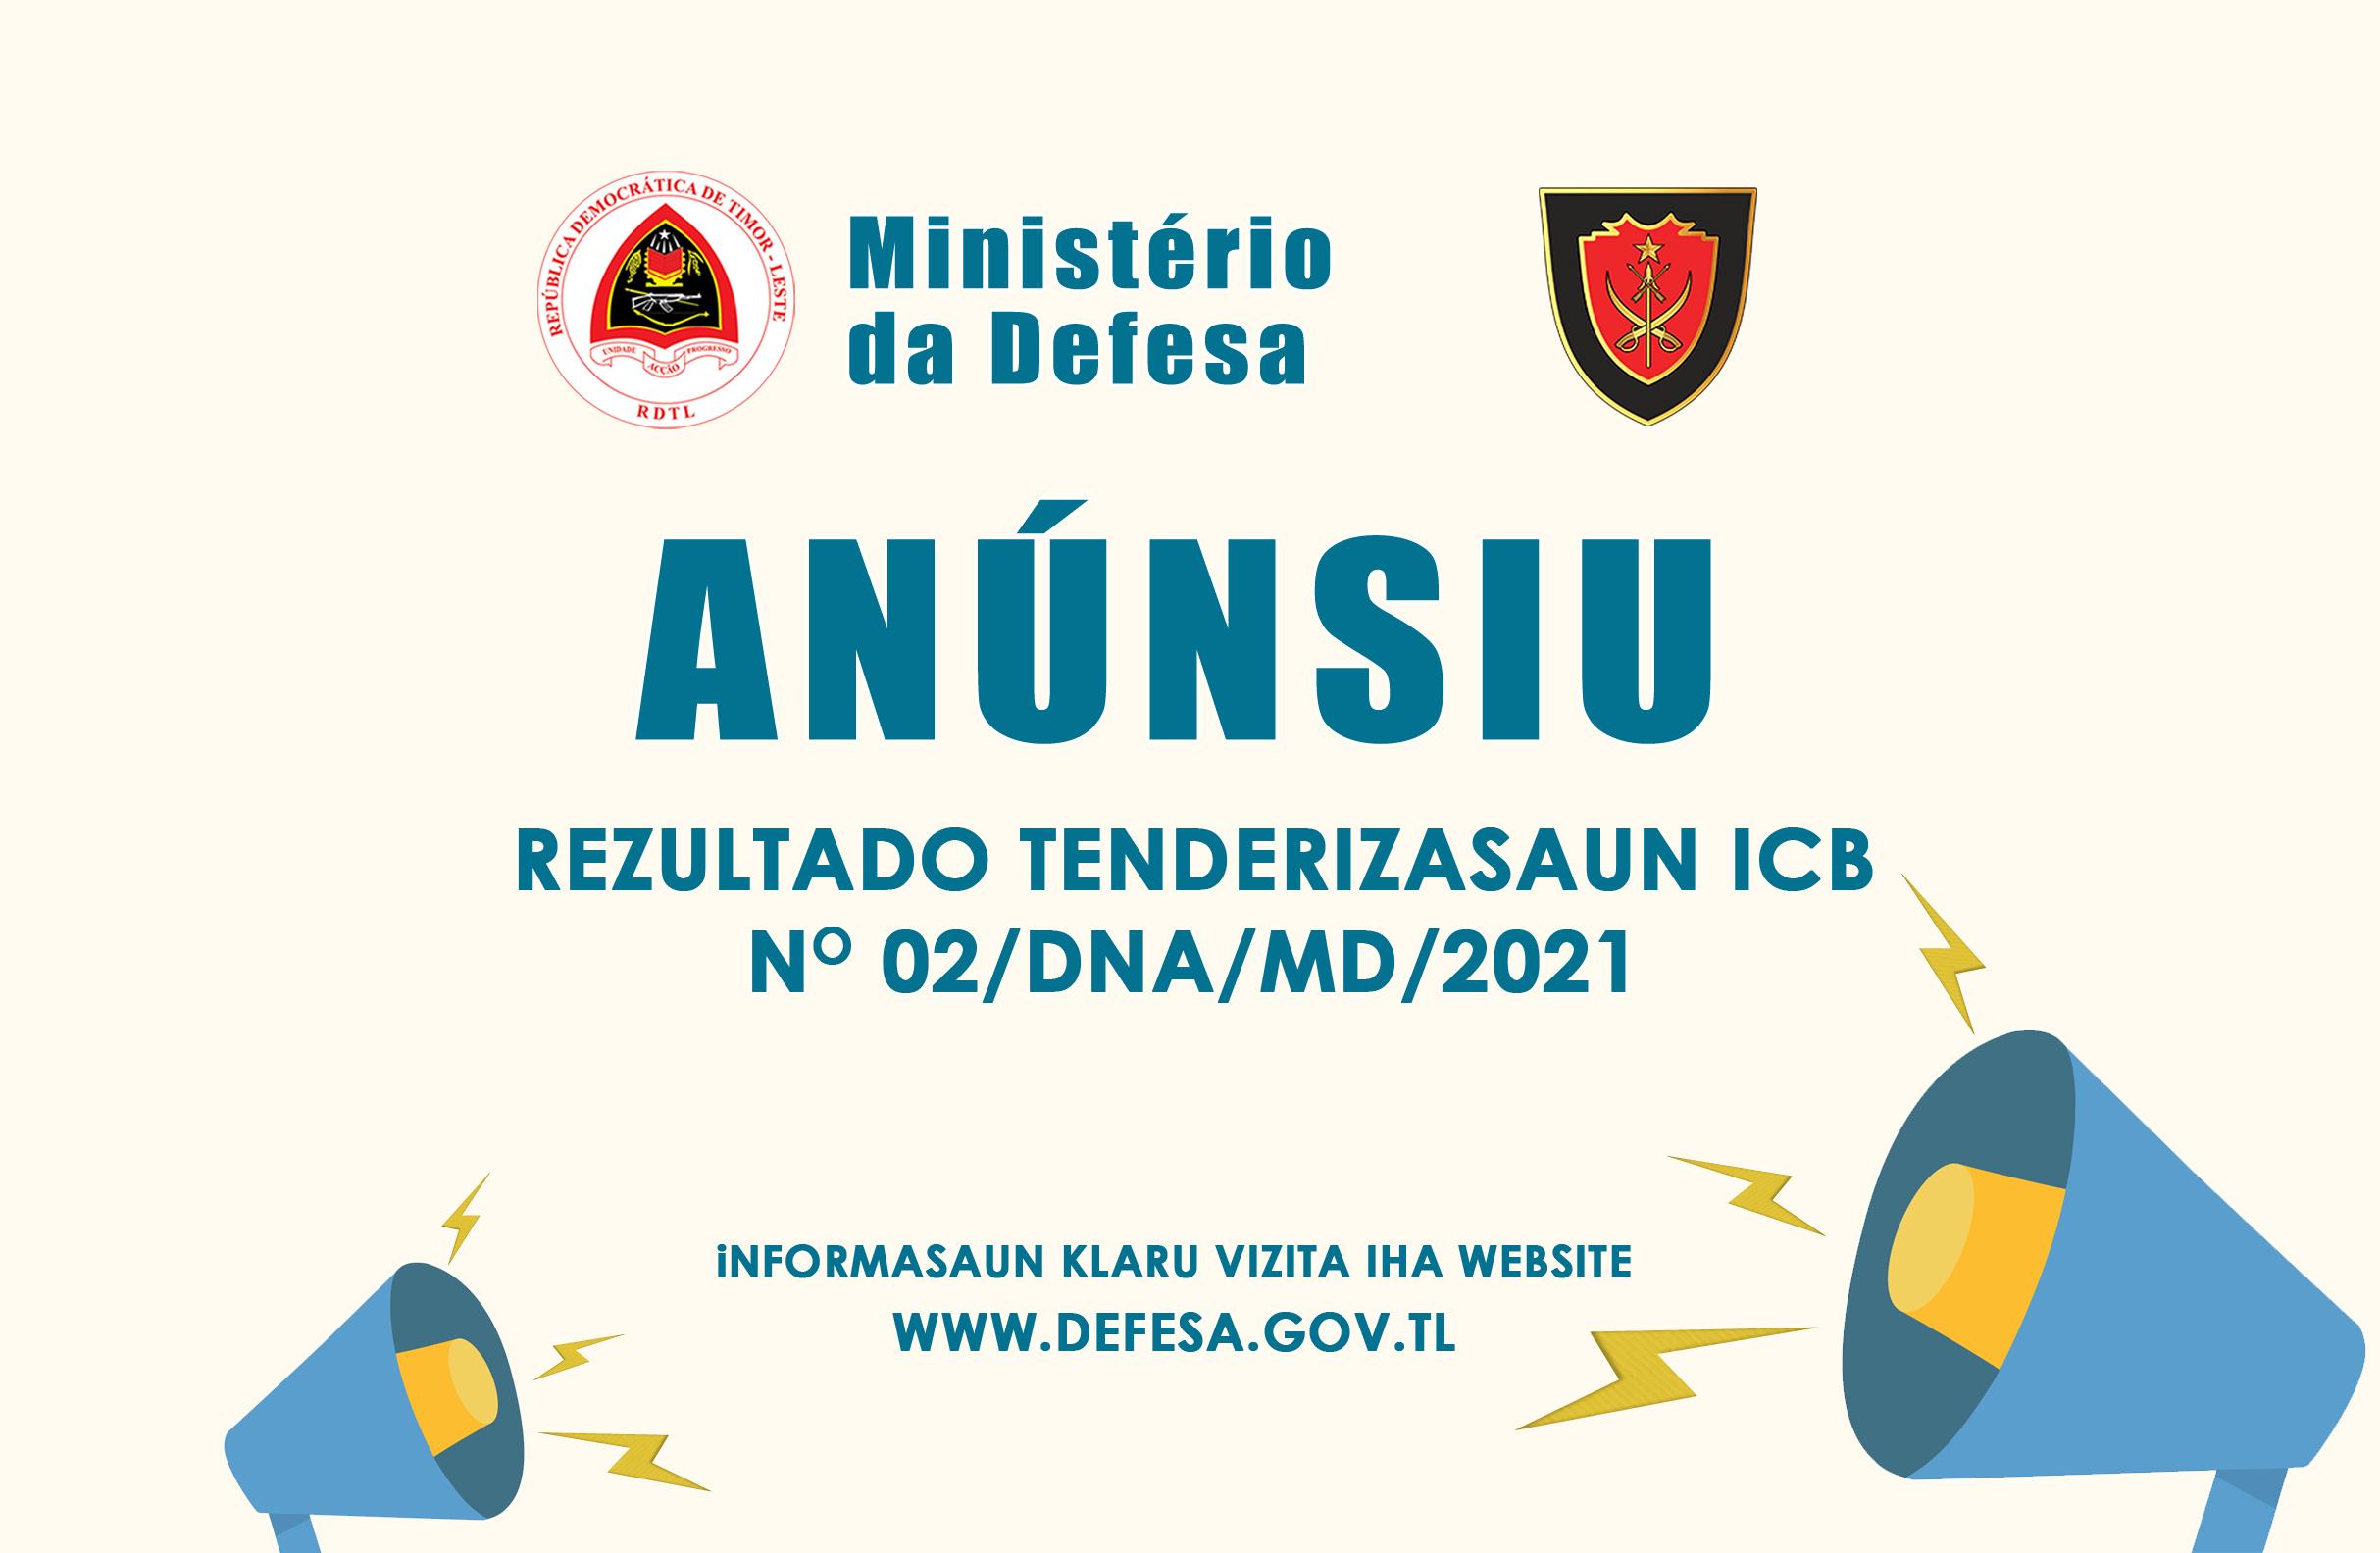 REZULTADO TENDERIZASAUN ICB NO 02/DNA/MD/2021